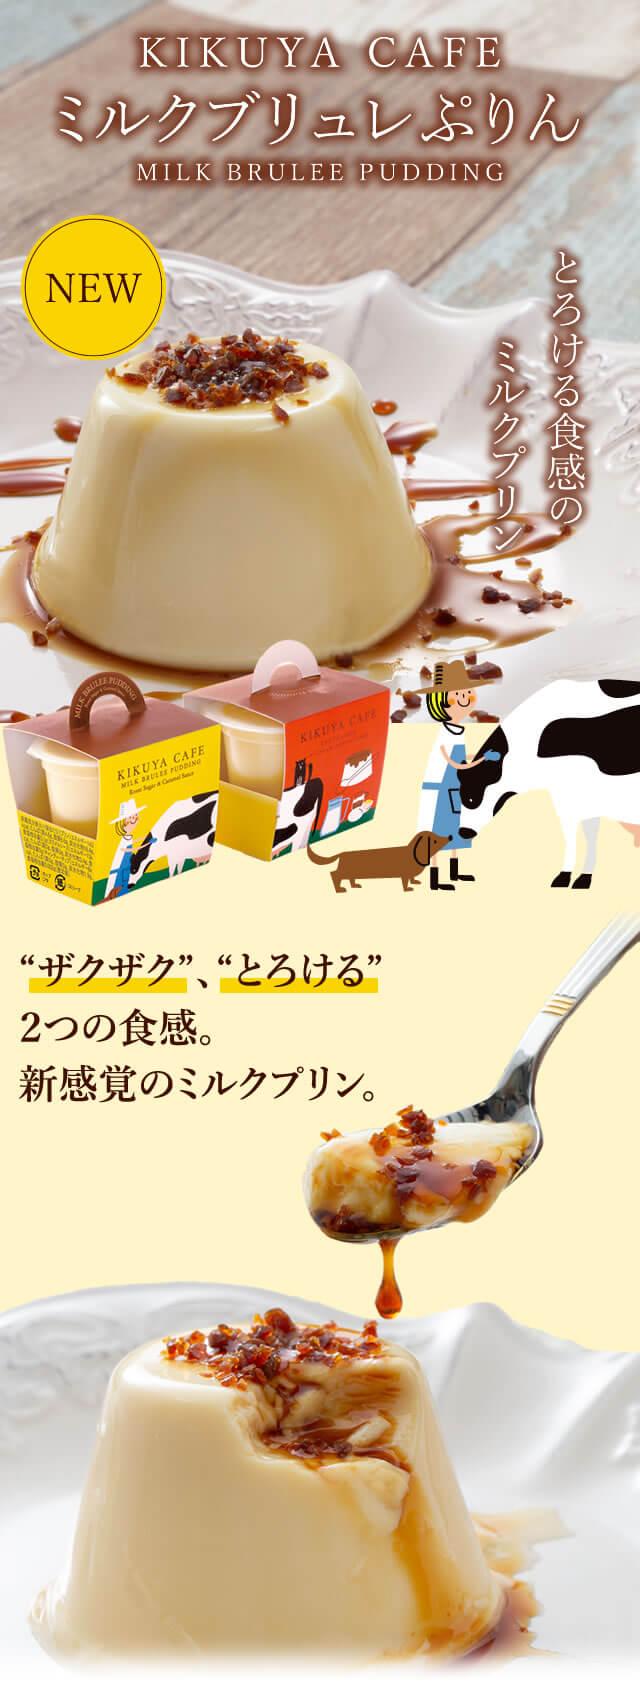 KIKUYA CAFE ミルクブリュレぷりん MILK BRULEE PUDDING とろける食感のミルクプリン